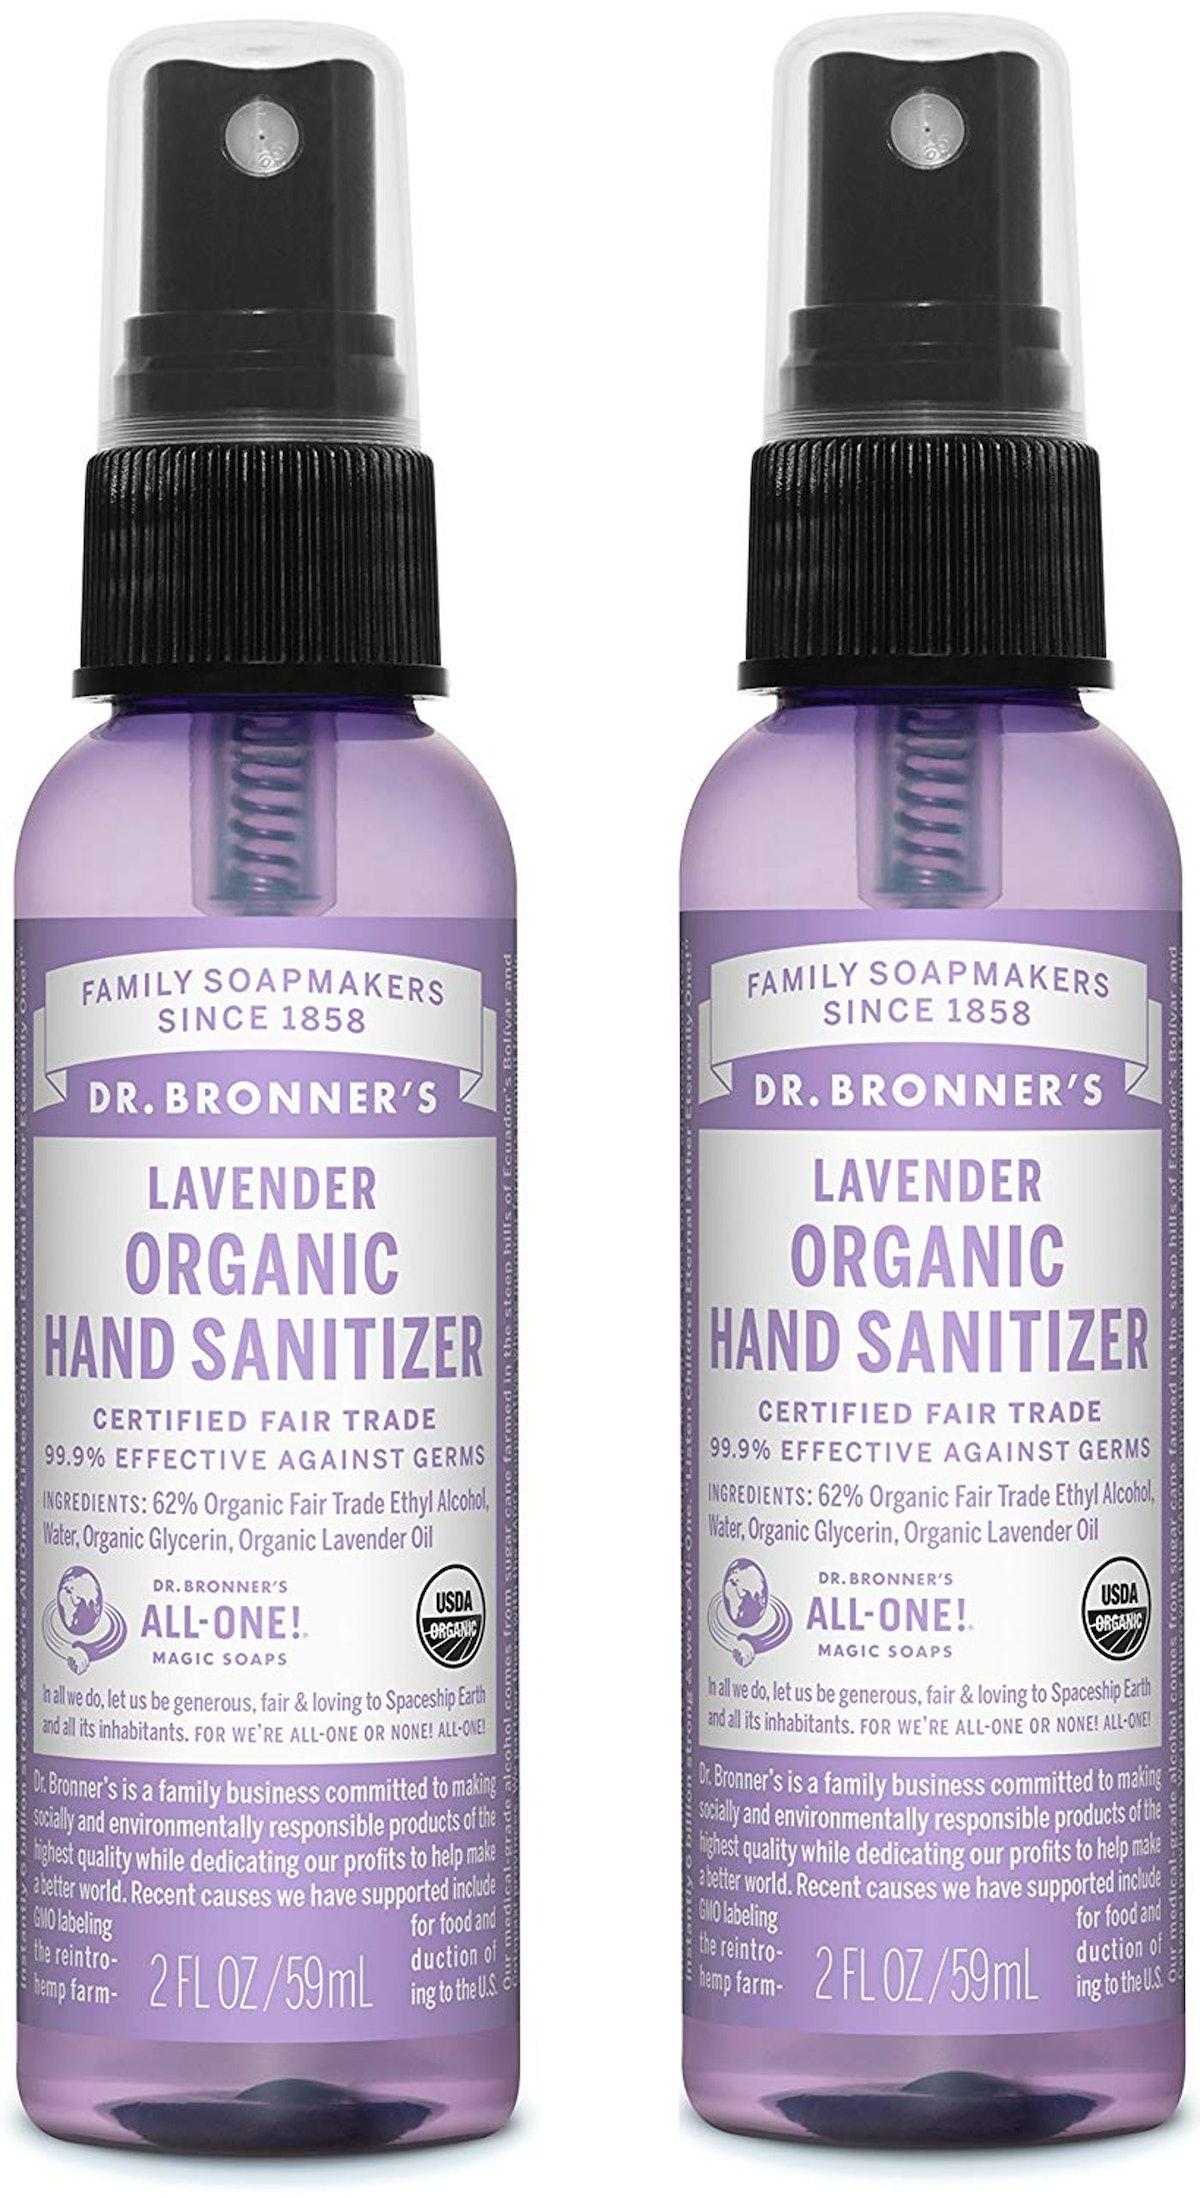 Dr. Bronner's Organic Hand Sanitizer